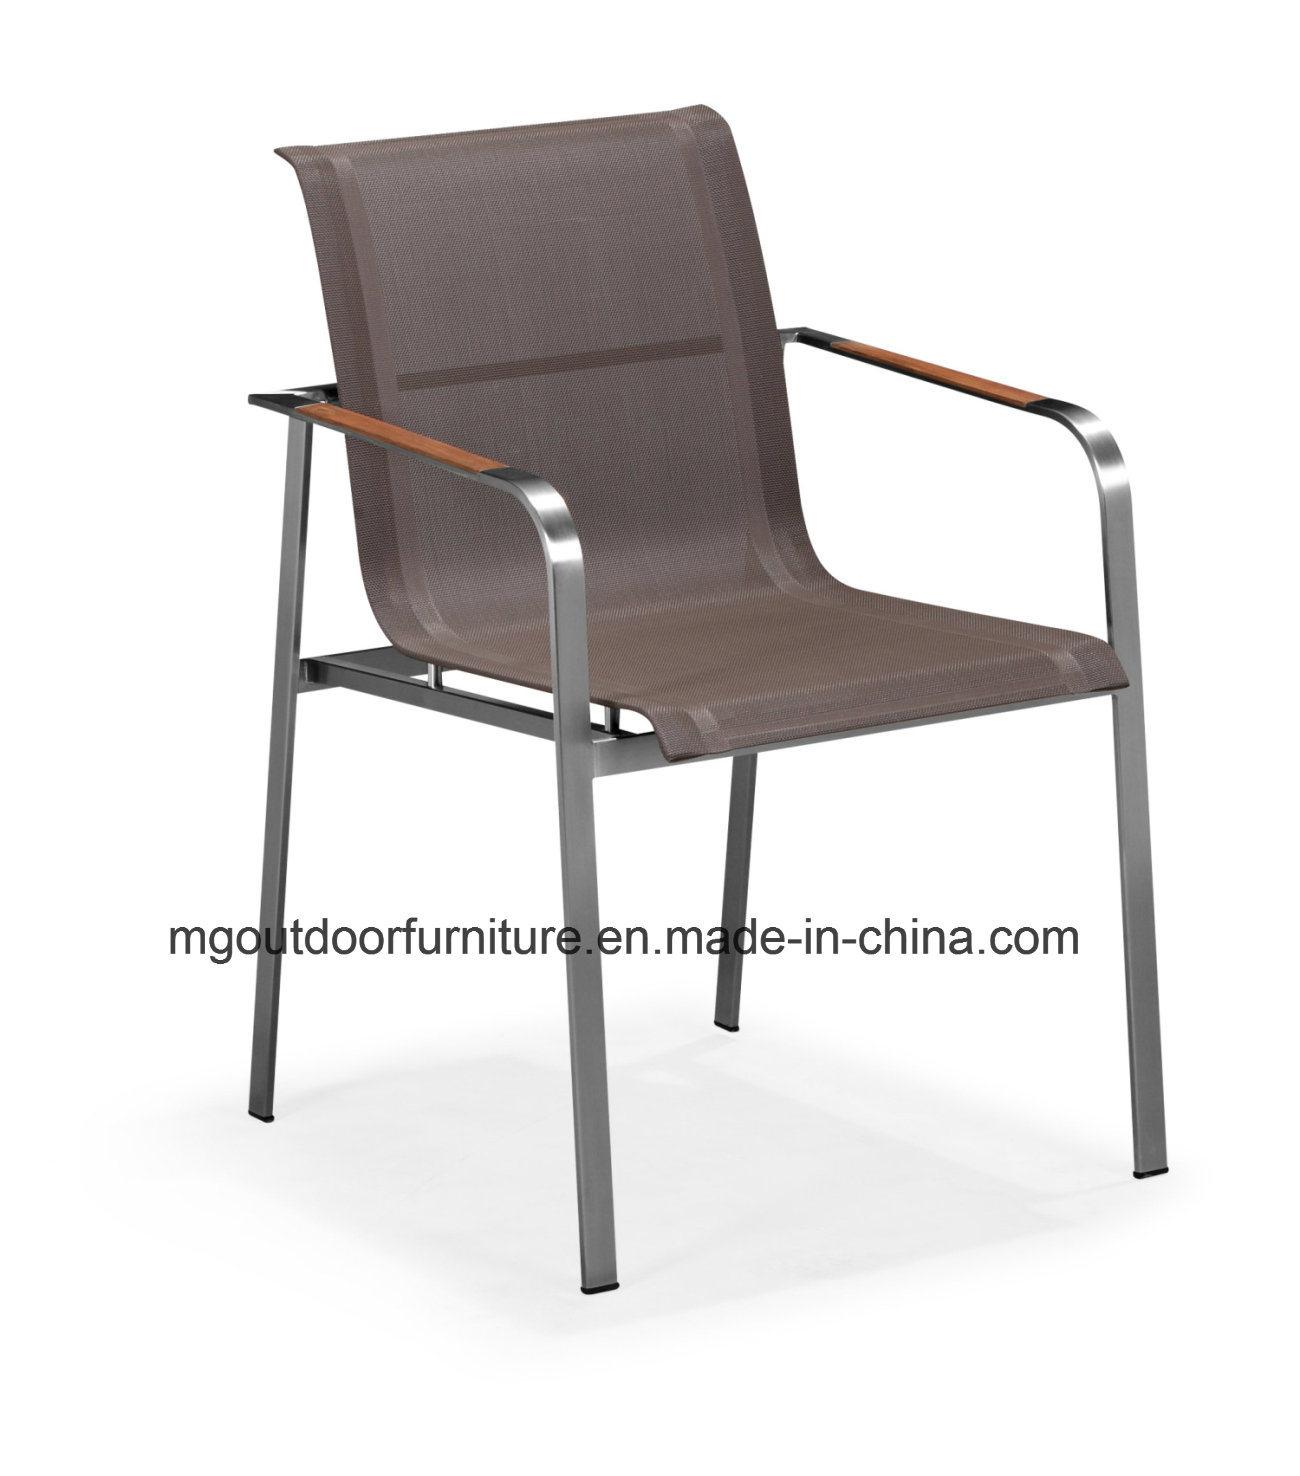 Foto de Venta caliente moderna silla de comedor Muebles de exterior ...